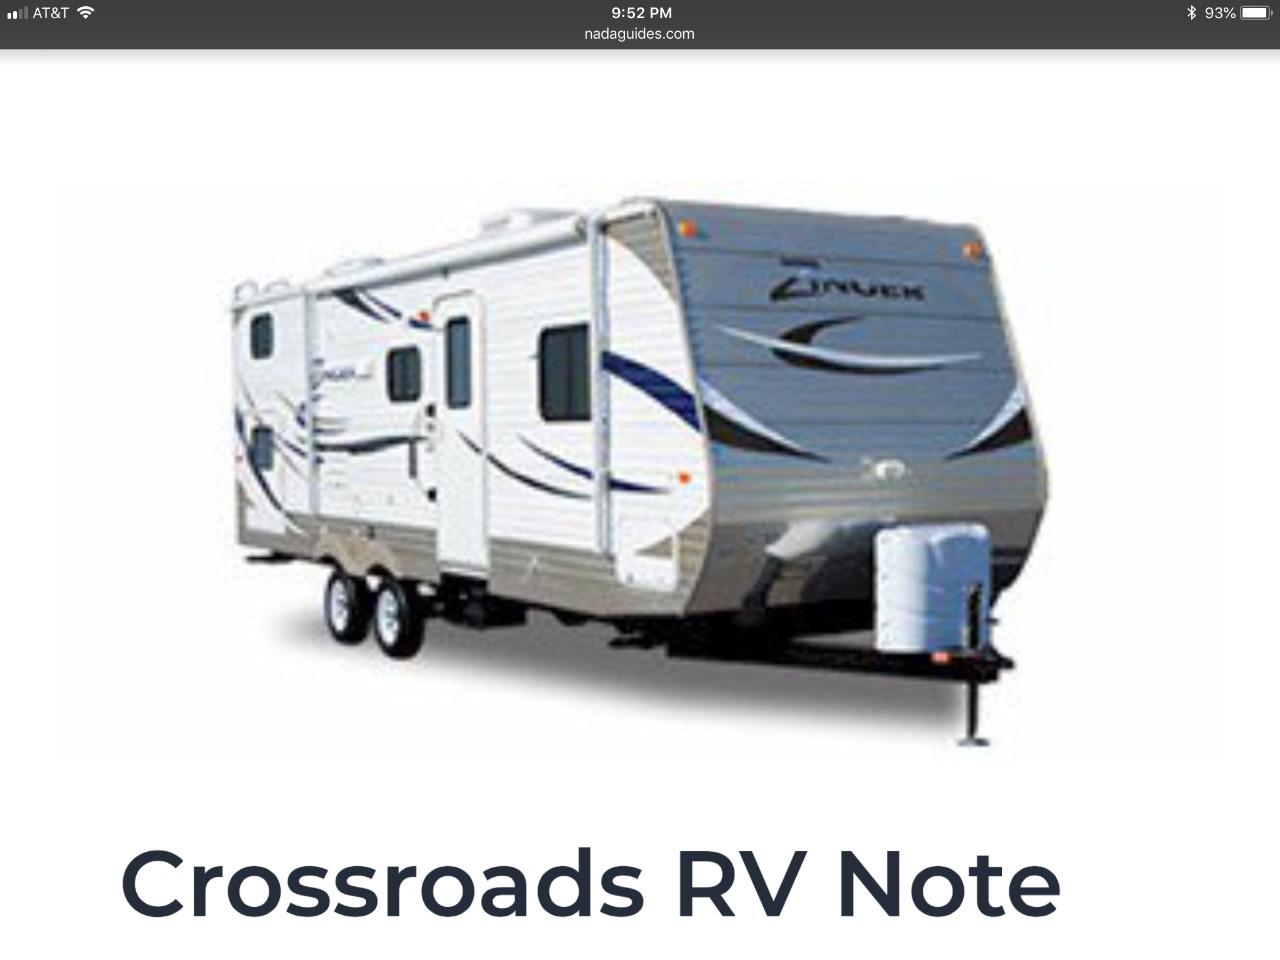 Crossroads Crossroads Zinger 270RL For Sale - Crossroads RVs - RvTrader.com